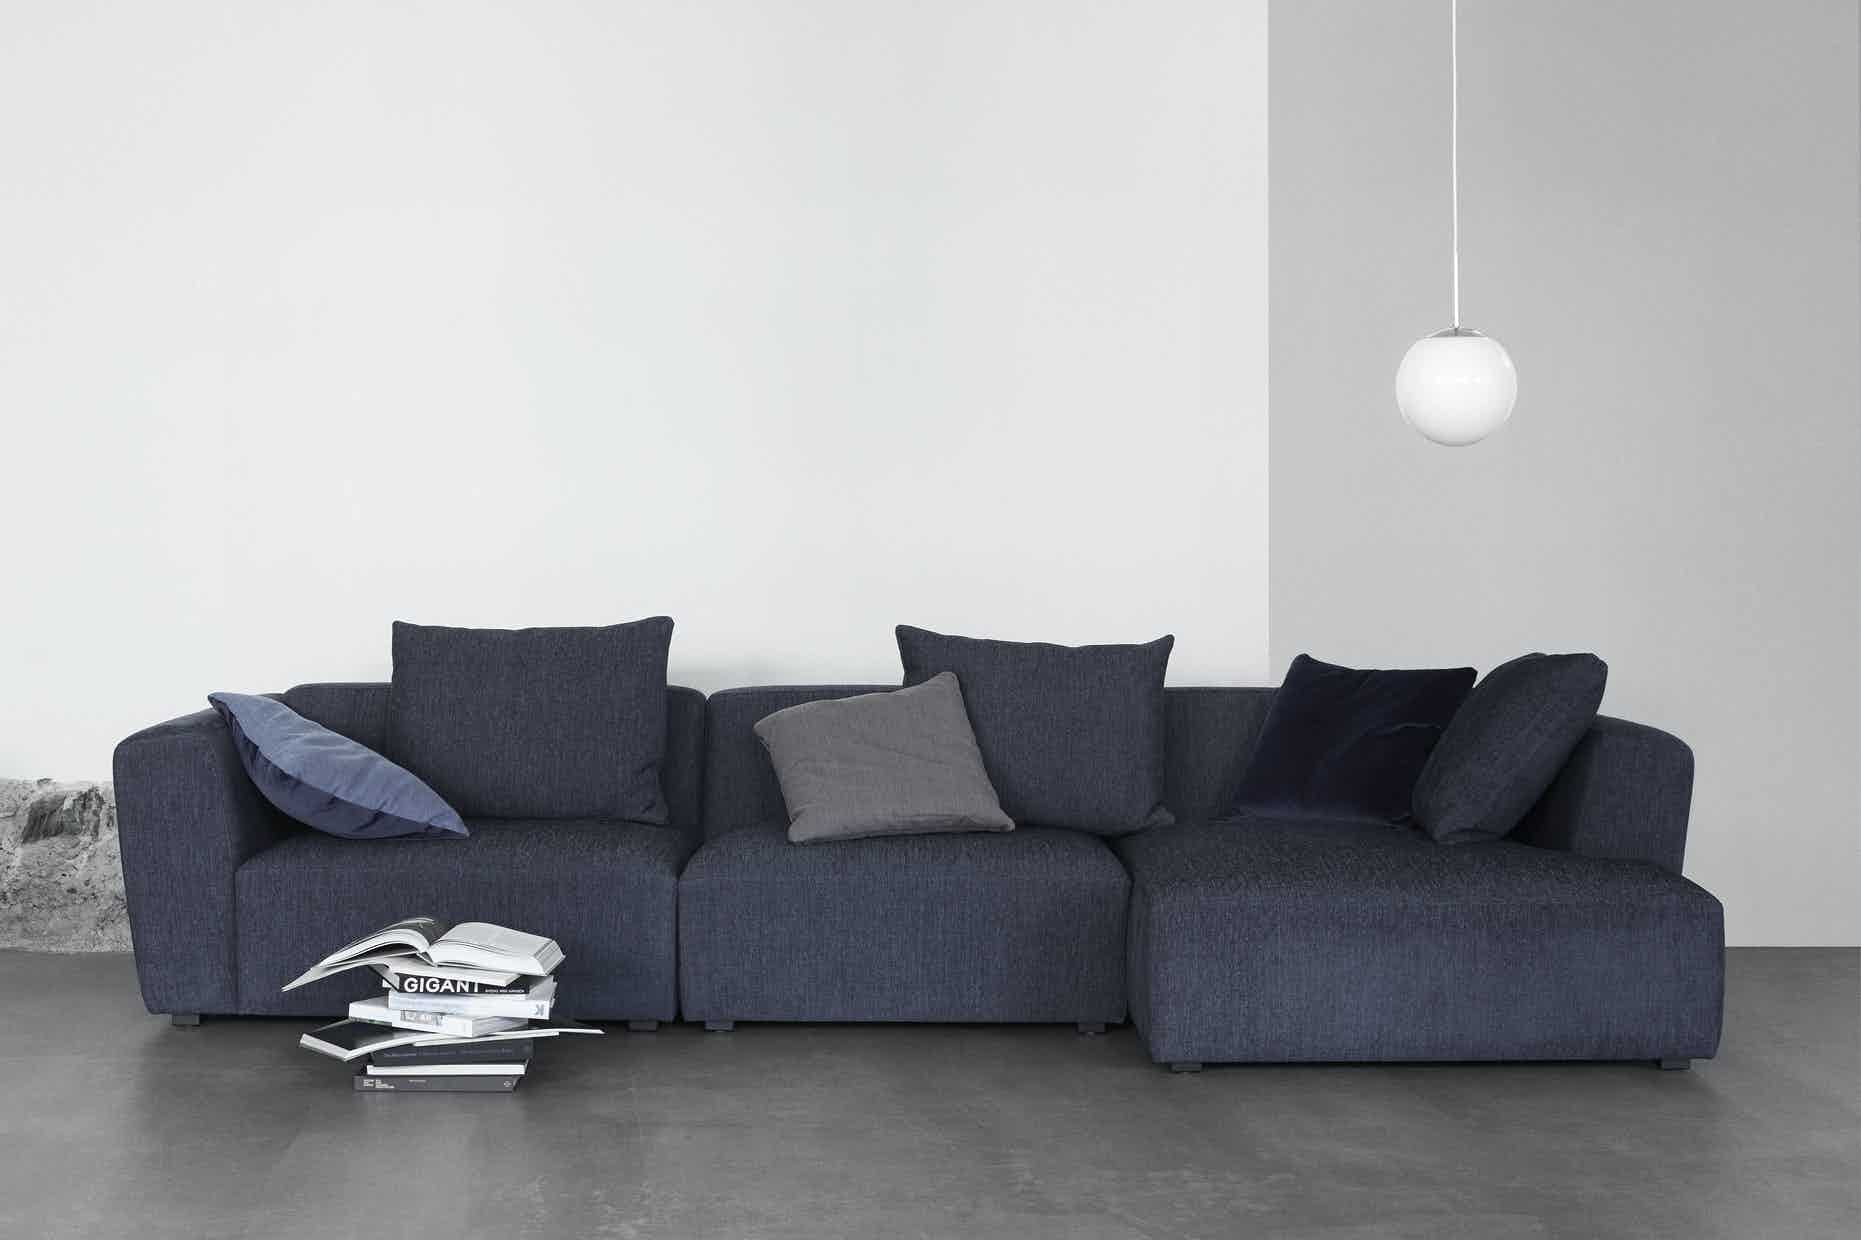 Wendelbo-front-domino-sofa-institu-haute-living